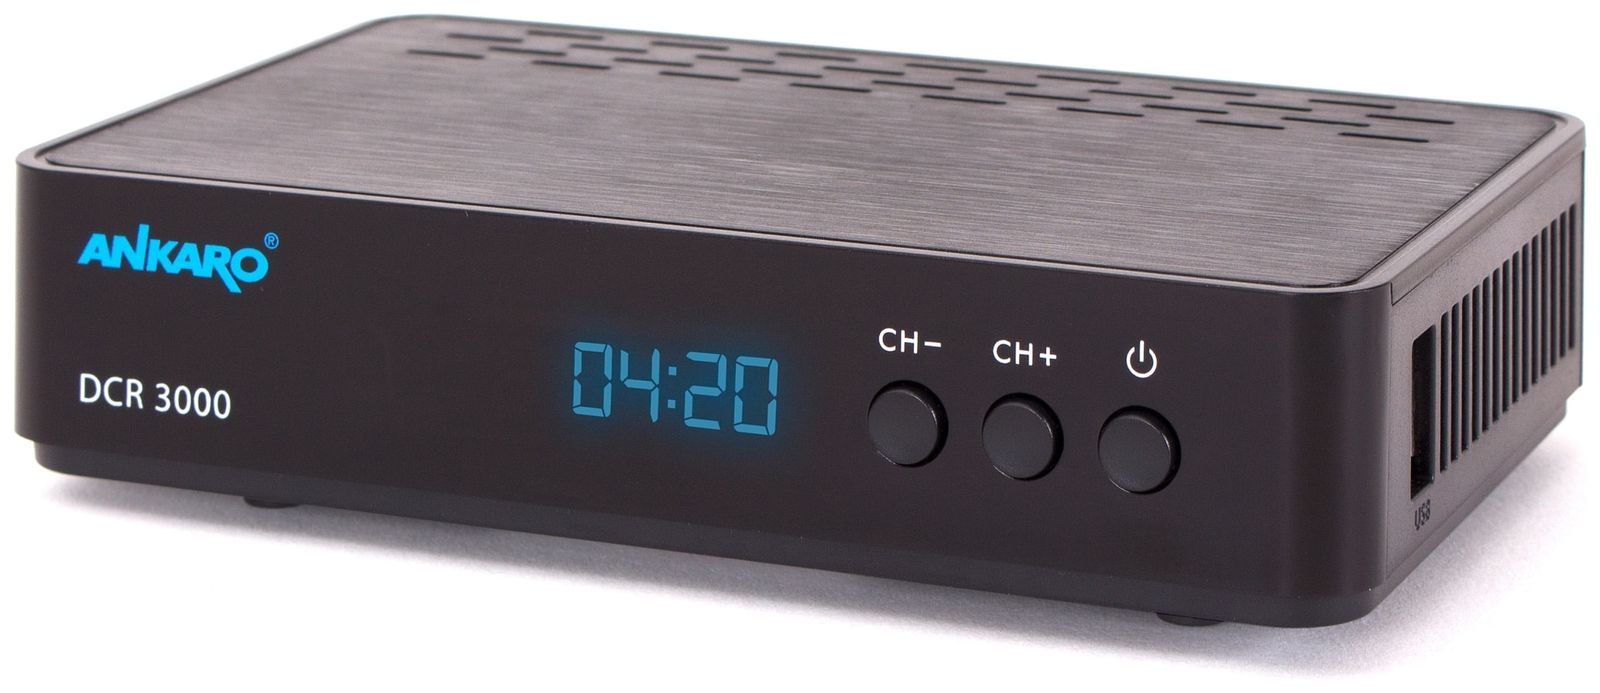 dvb c hdtv receiver ankaro dcr 3000 pvr online kaufen. Black Bedroom Furniture Sets. Home Design Ideas